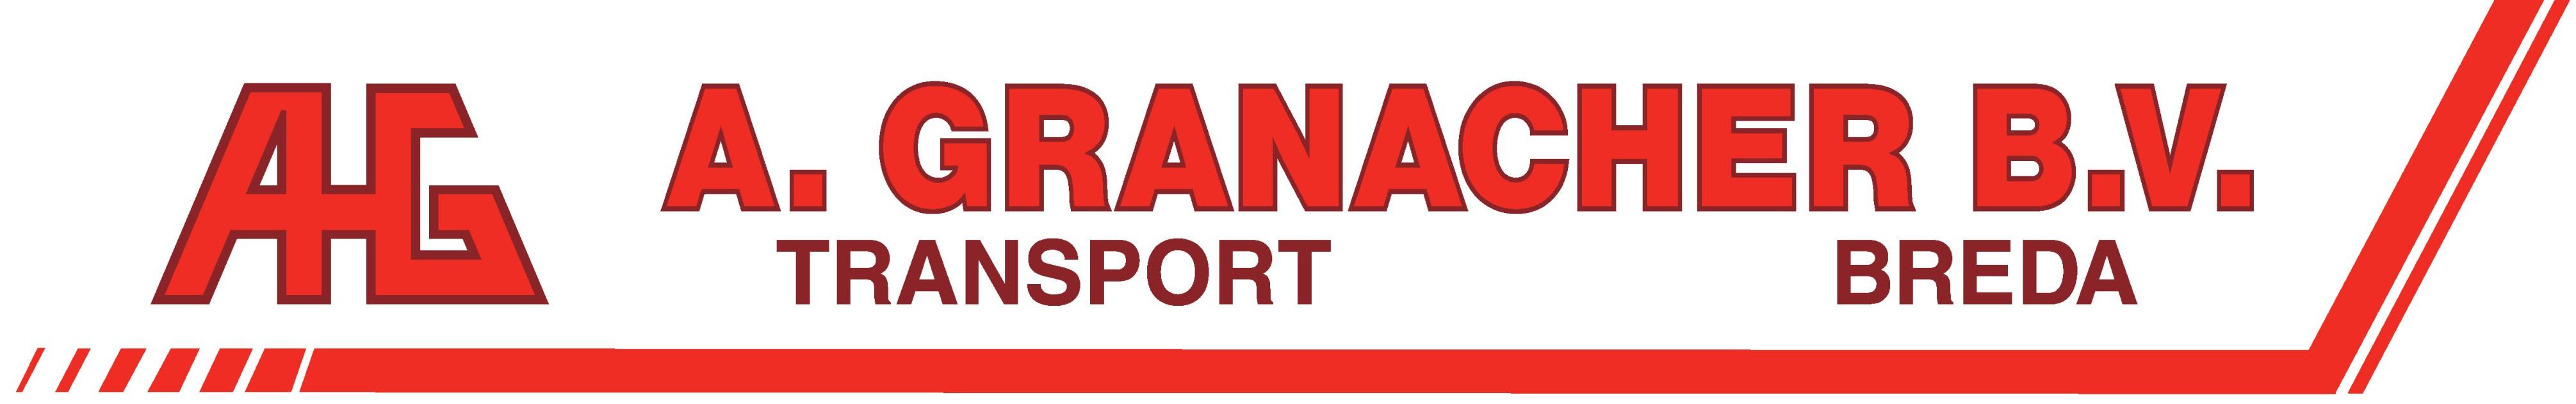 Transportbedrijf Granacher